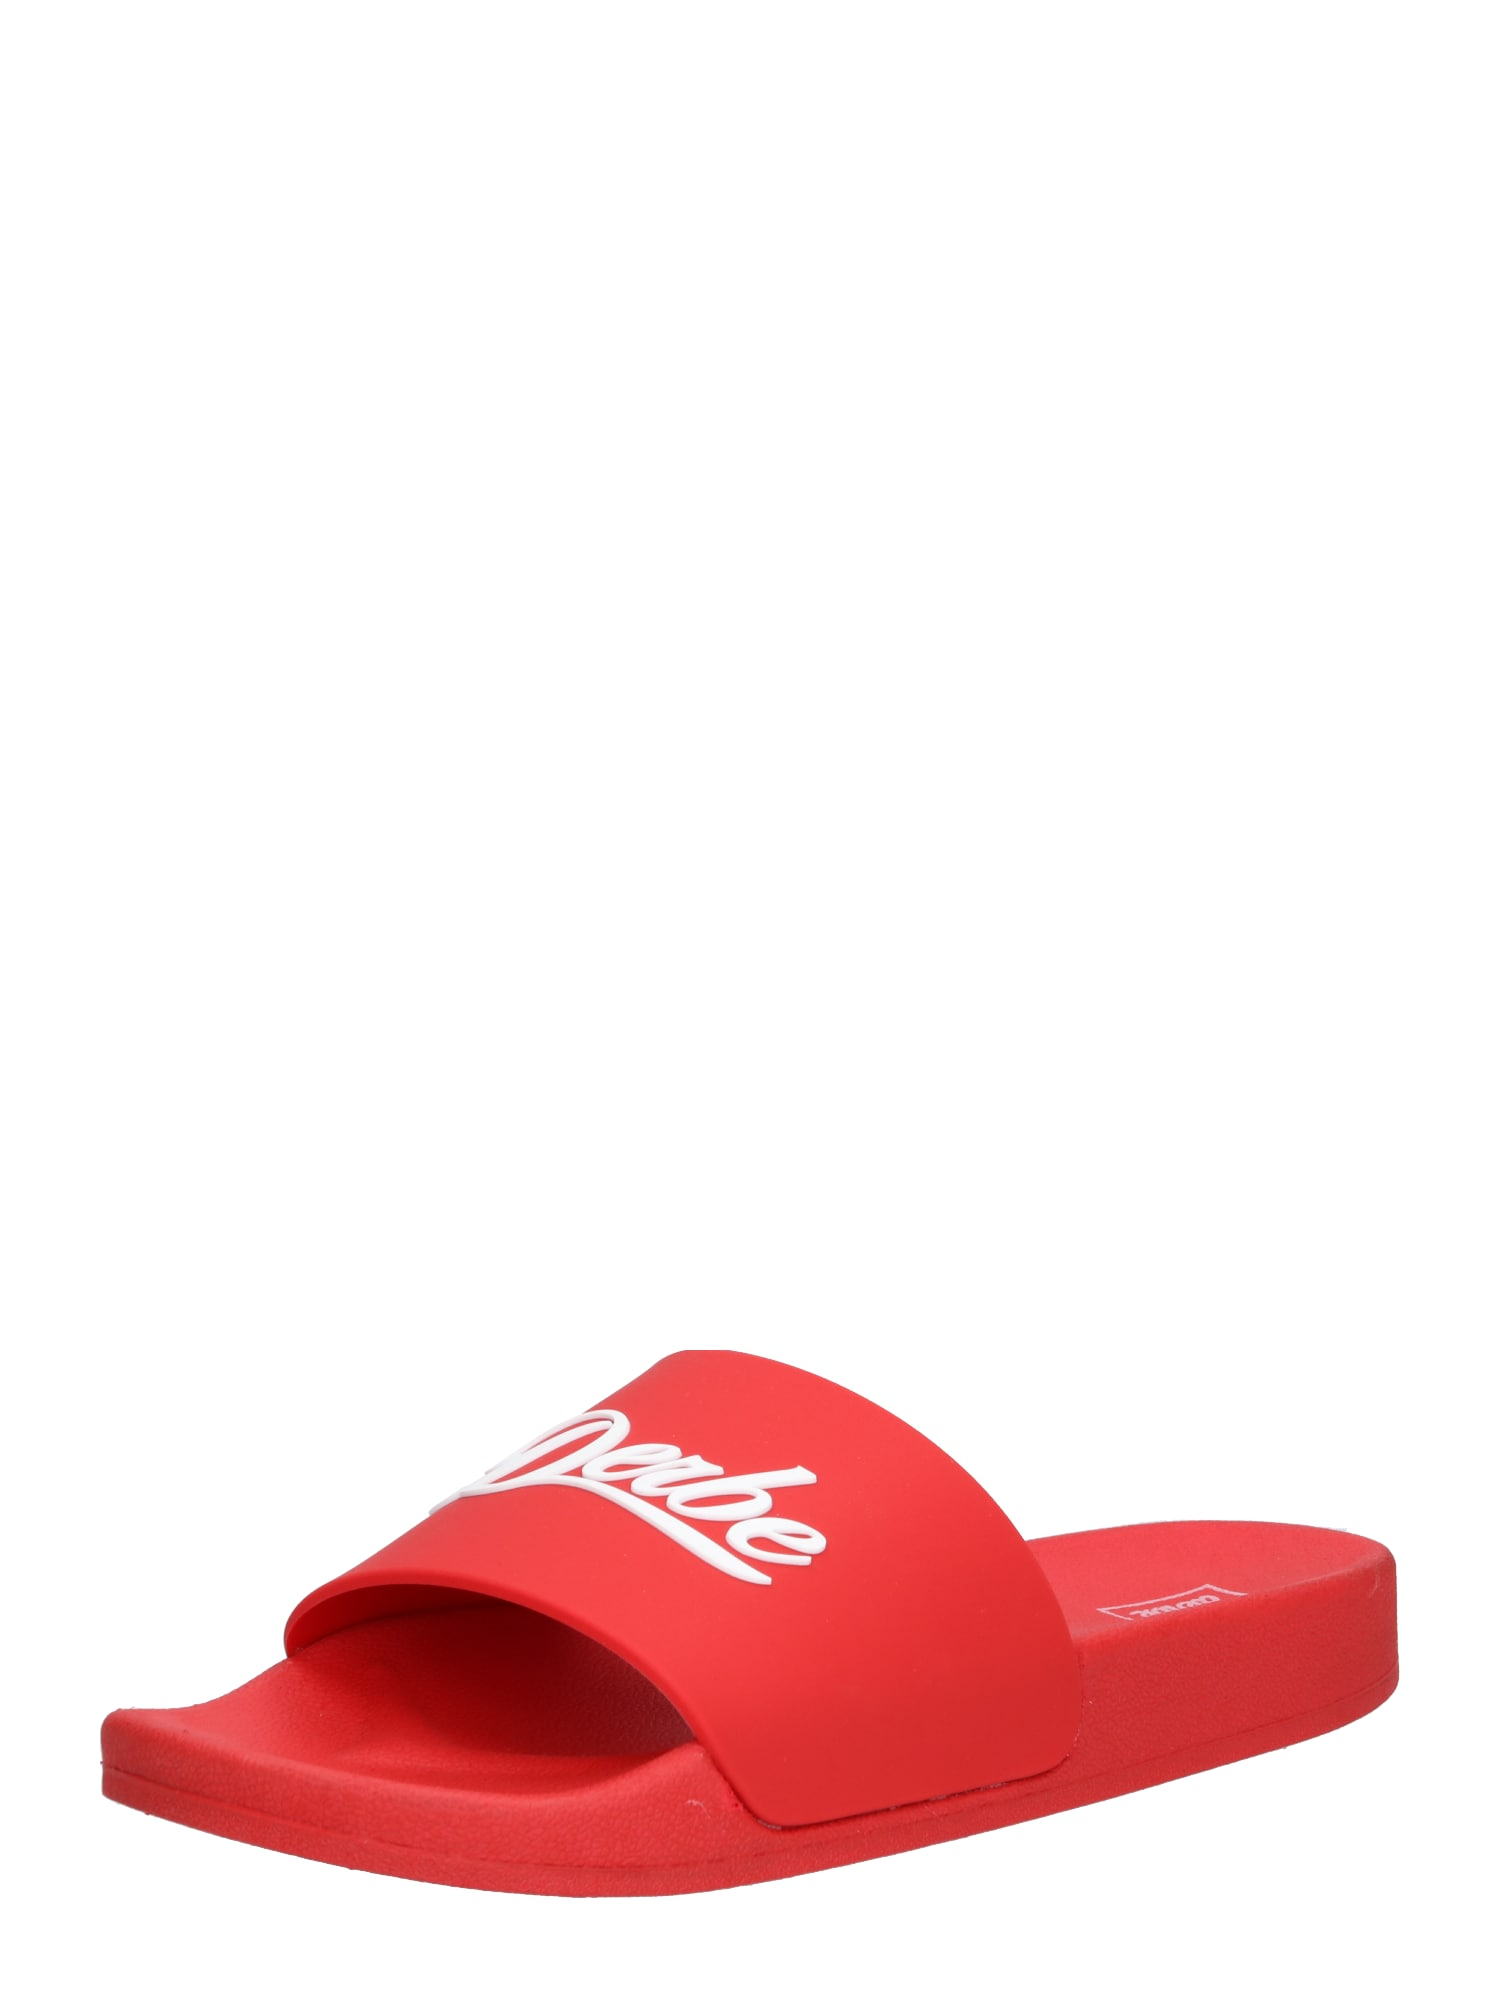 Pantofle Buddellette červená bílá Derbe